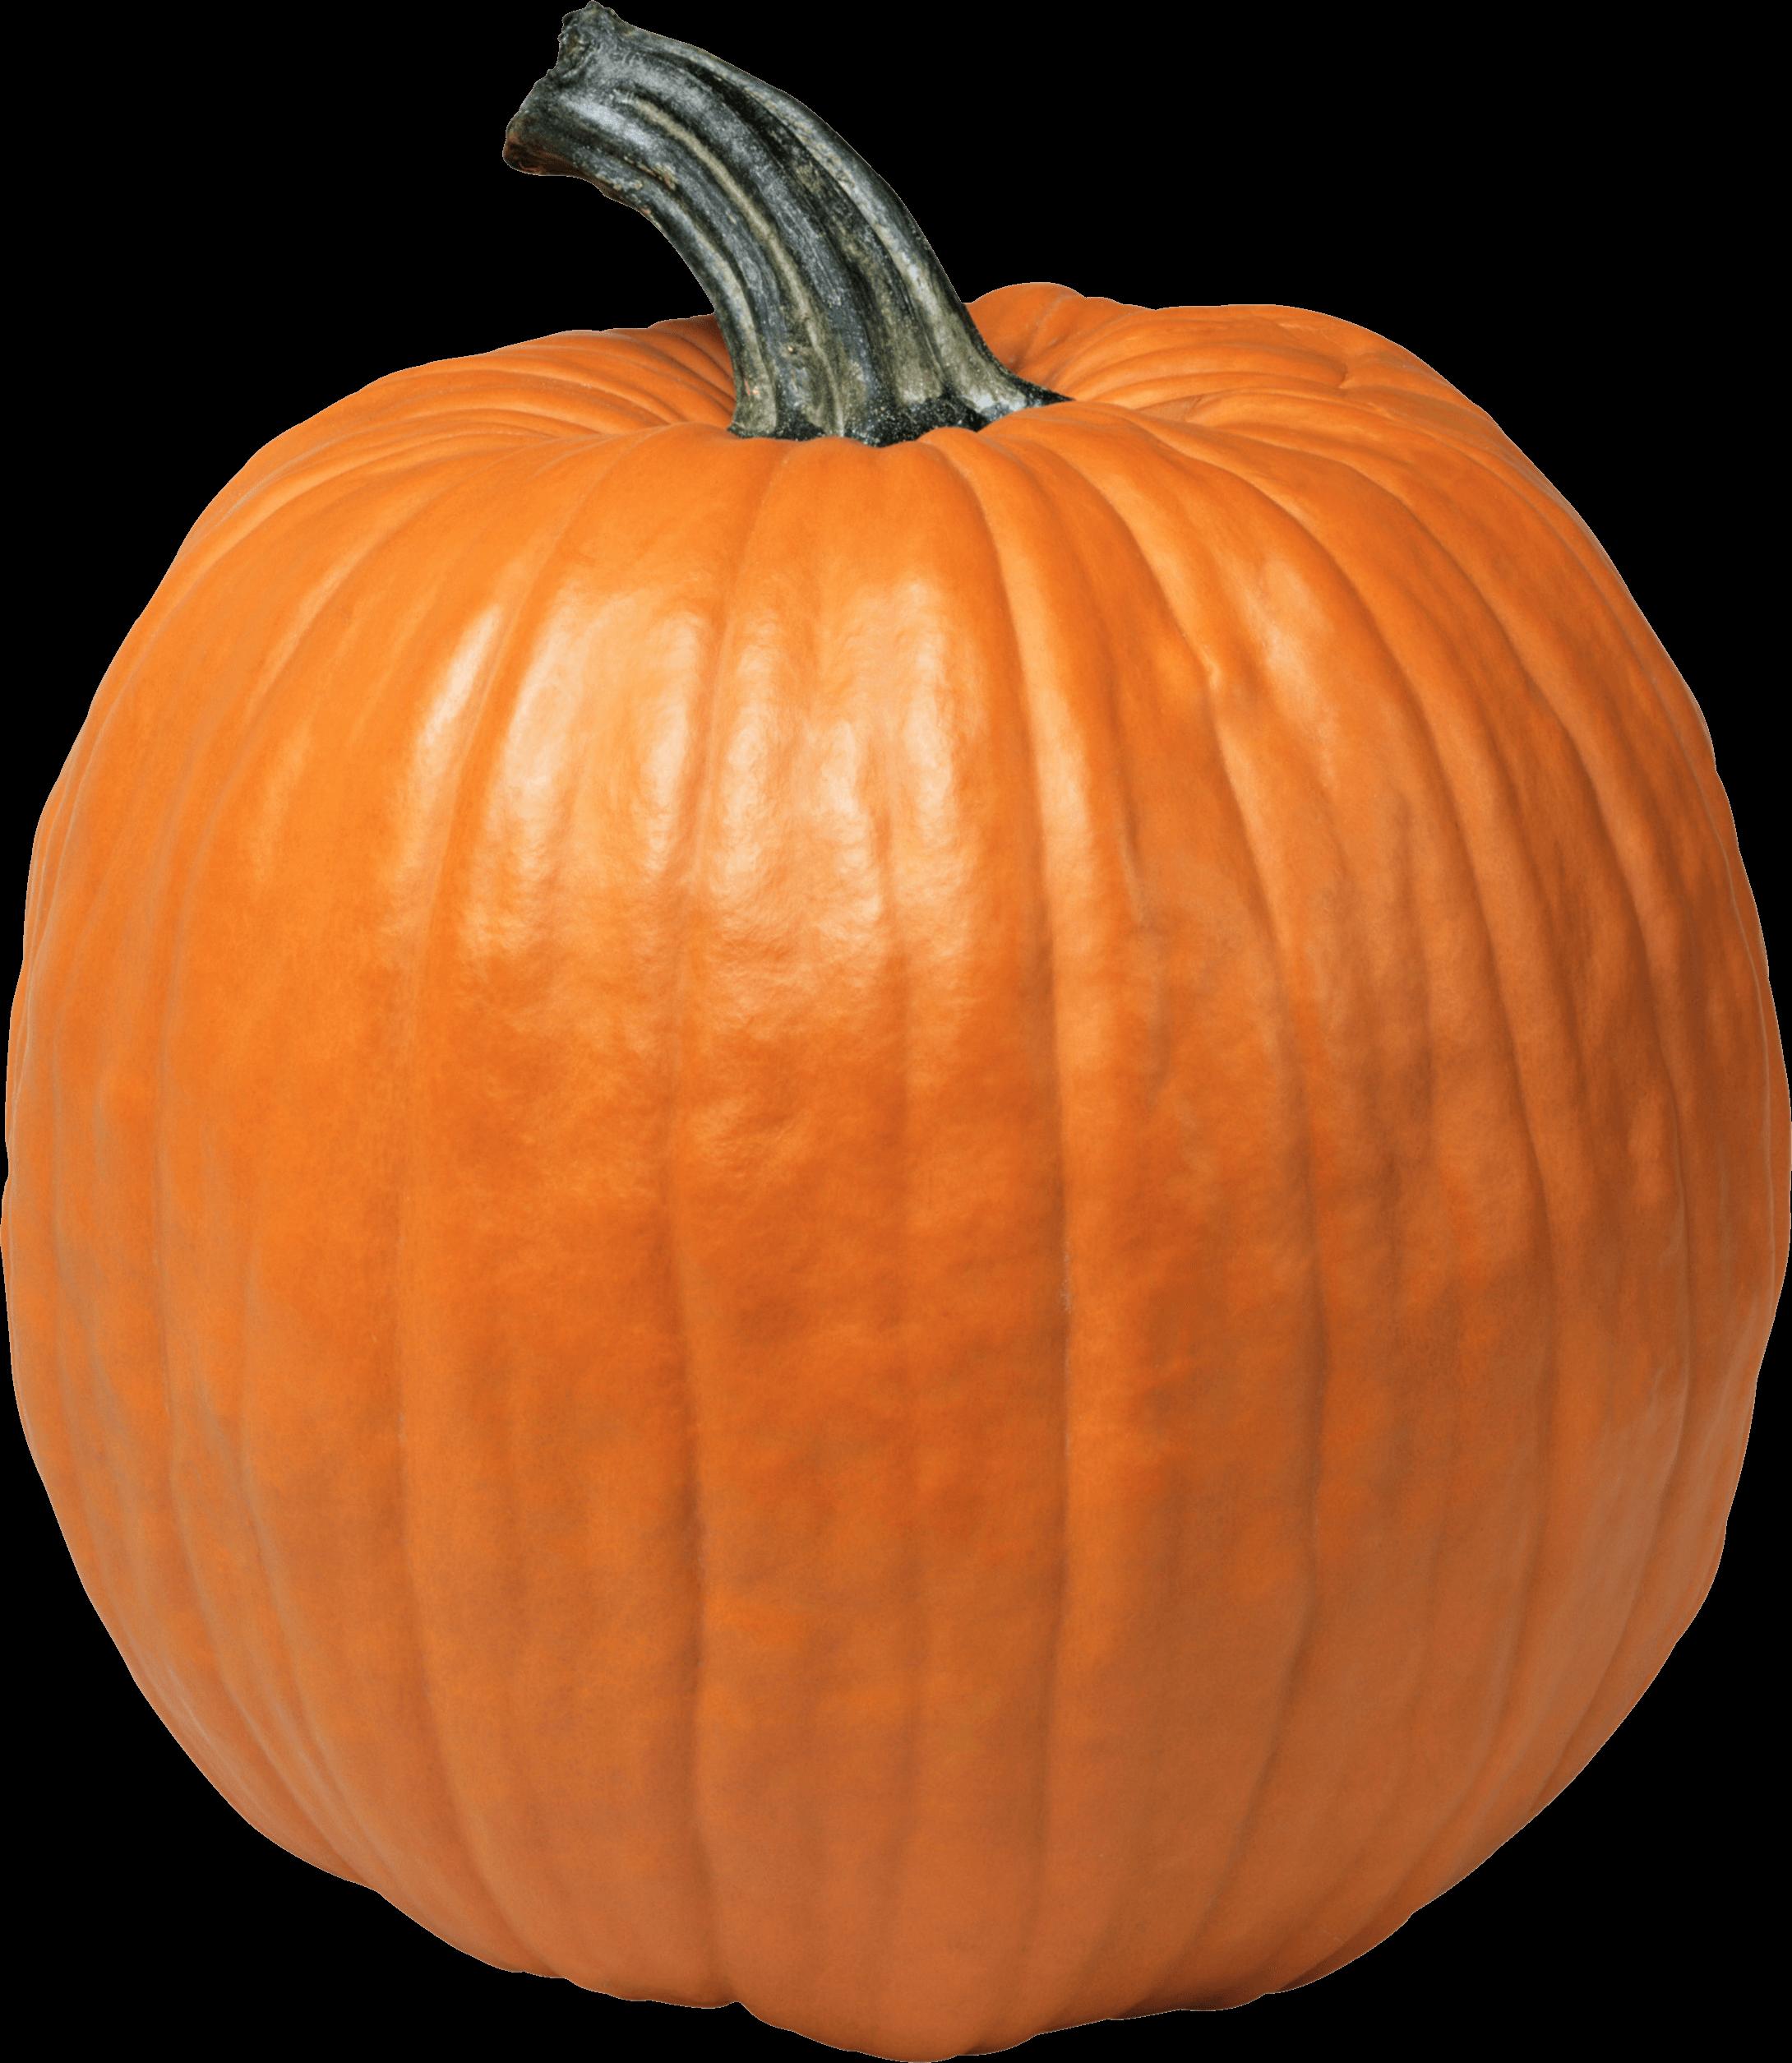 Single Pumpkin Transparent PNG